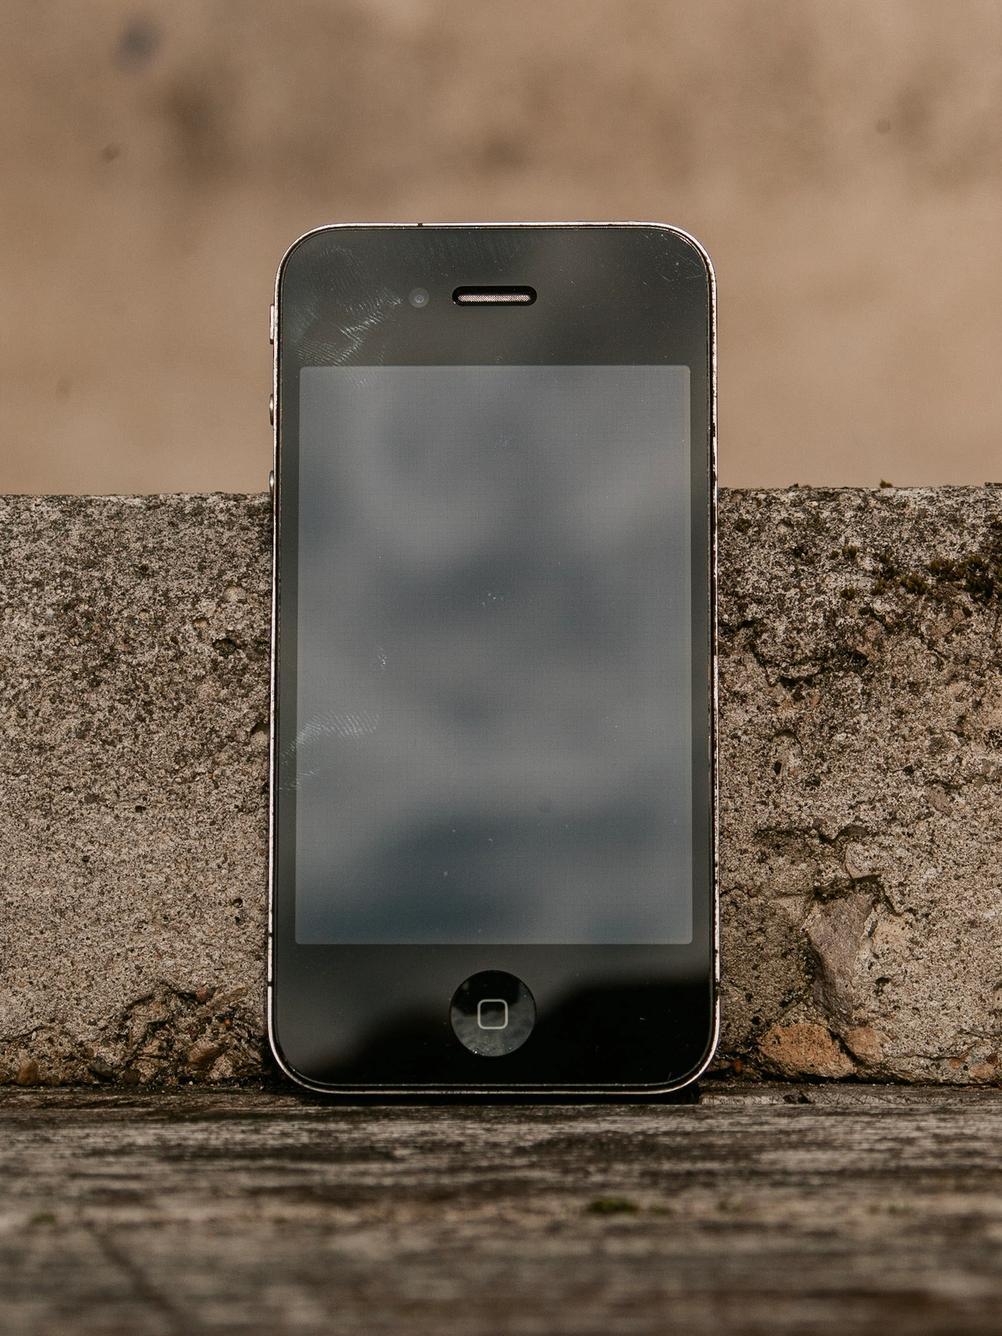 Photo of iPhone 4.